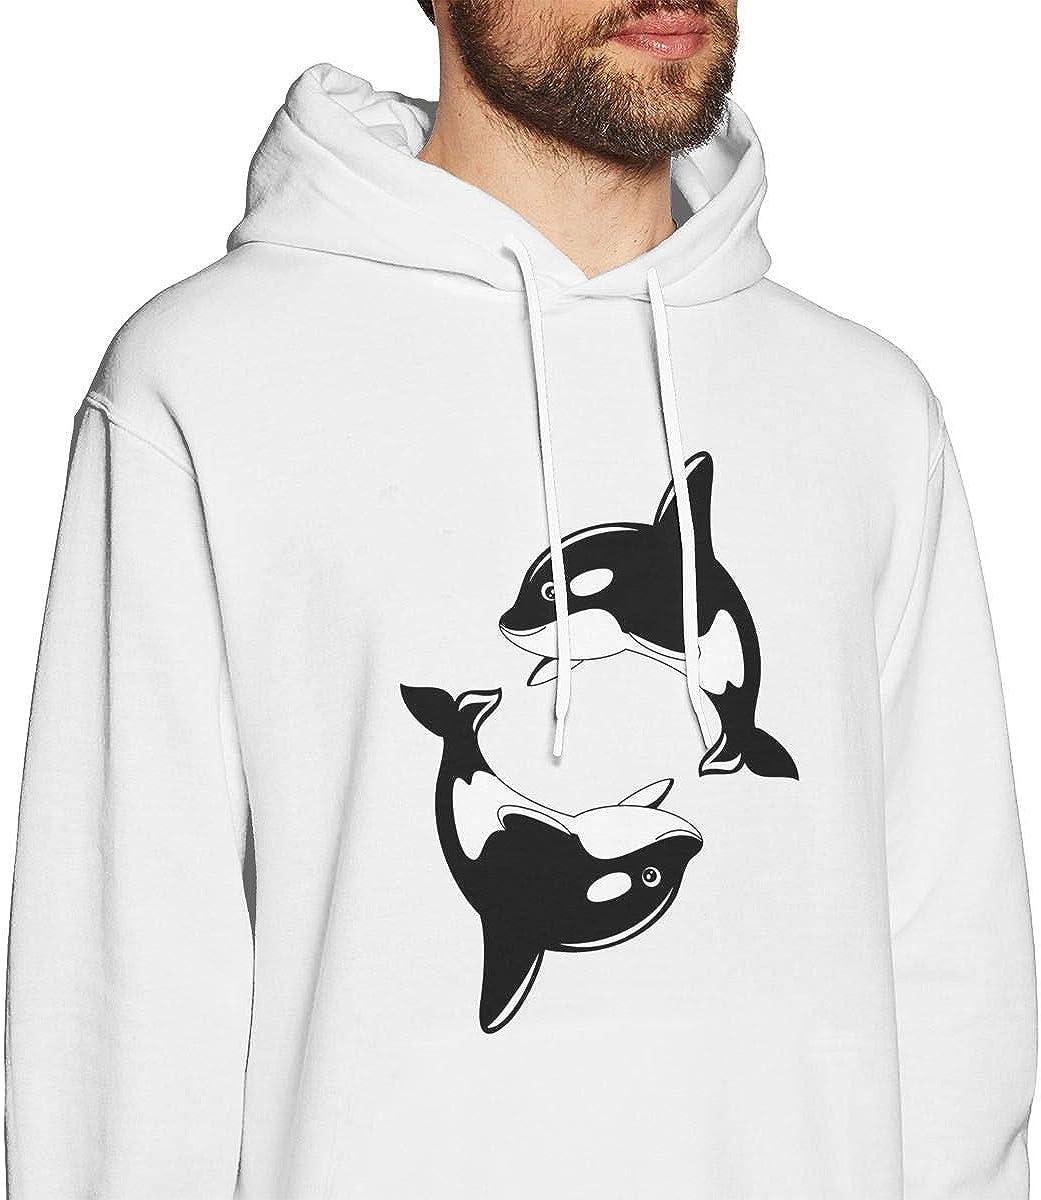 FTHX Mens Hoodies Orca Whale Cool Pullover Hooded Print Sweatshirt Jackets